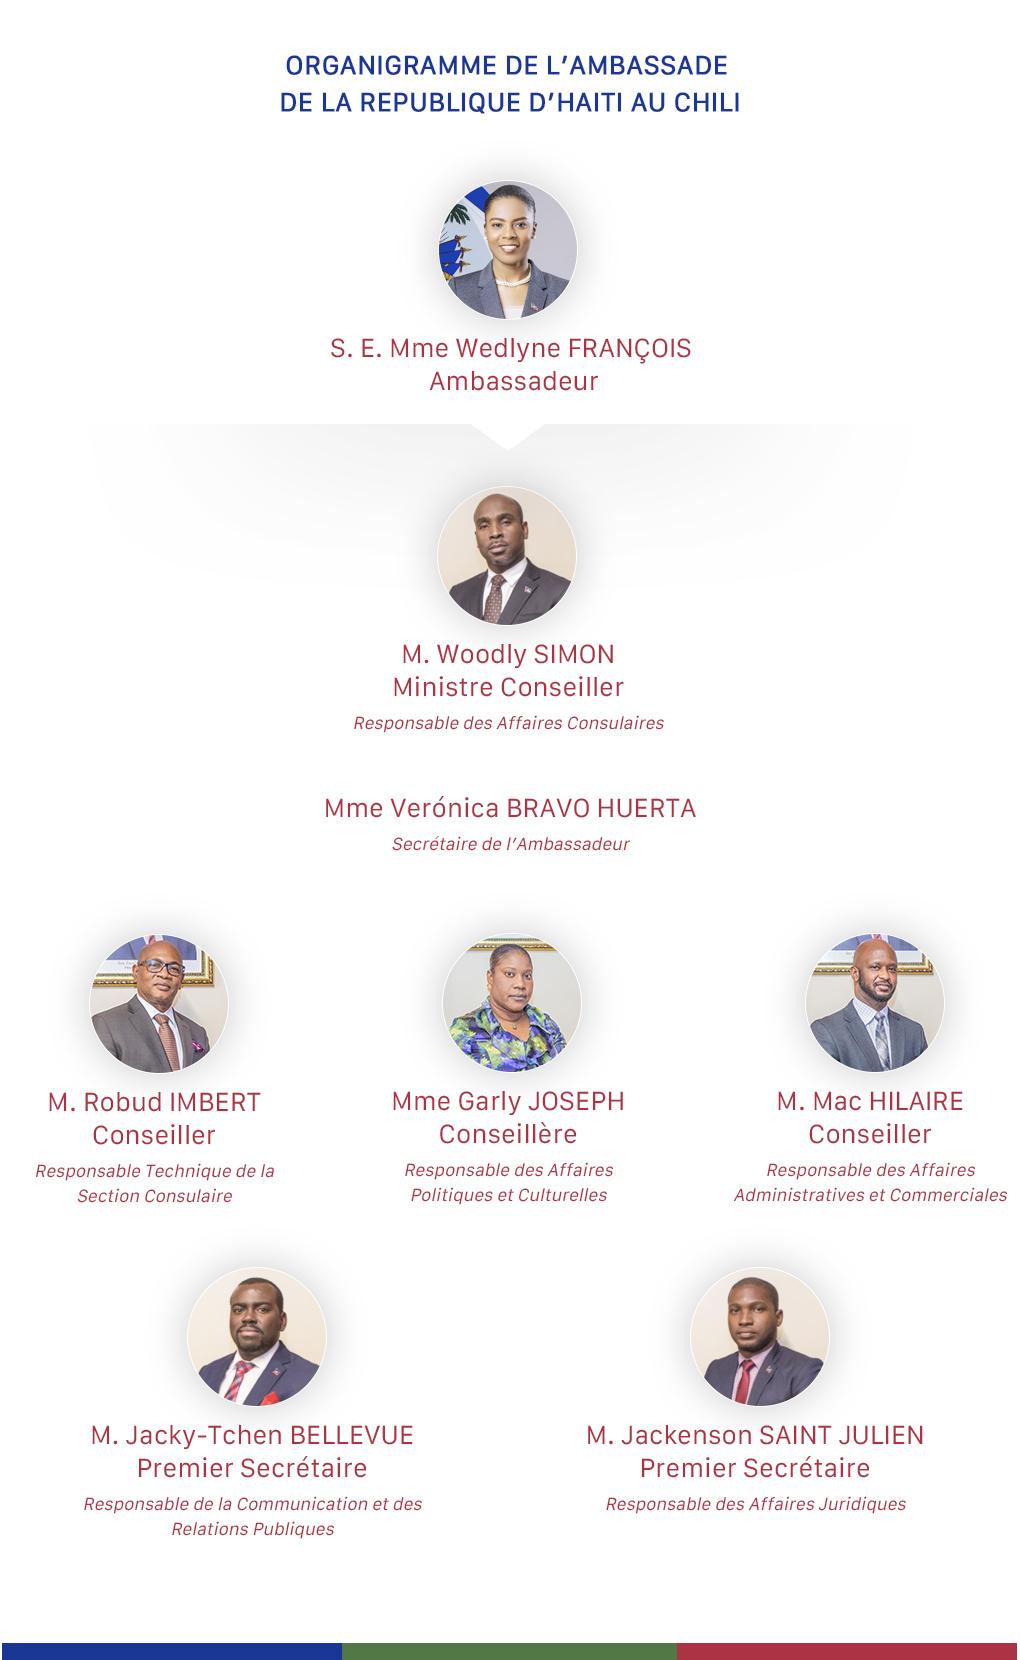 Organigramme Ambassade de la Republique D`Haiti au Chili